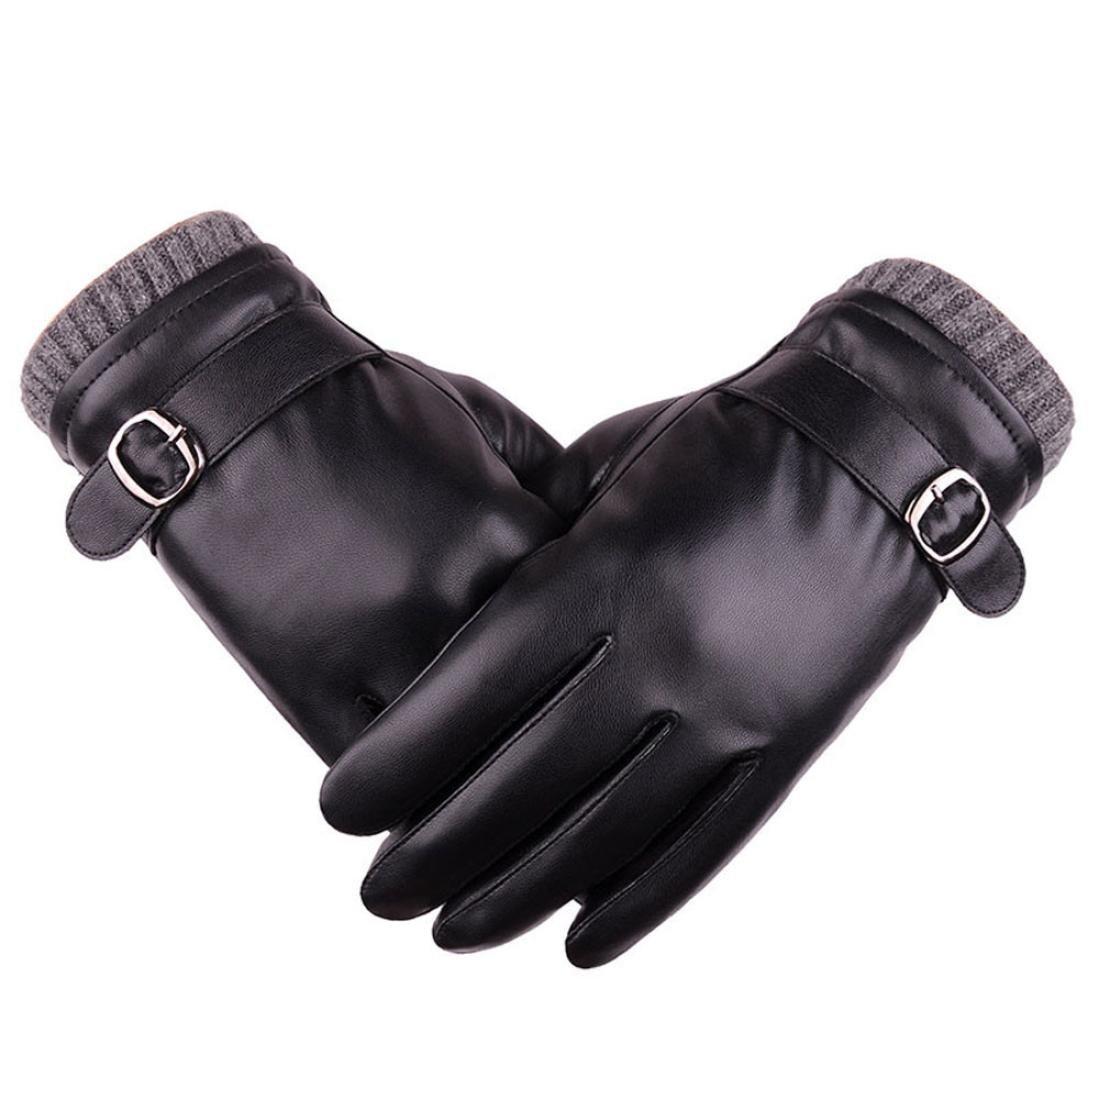 Binmer(TM) Mens Leather Winter Warm Waterproof Windproof Snow Snowboard Ski Gloves